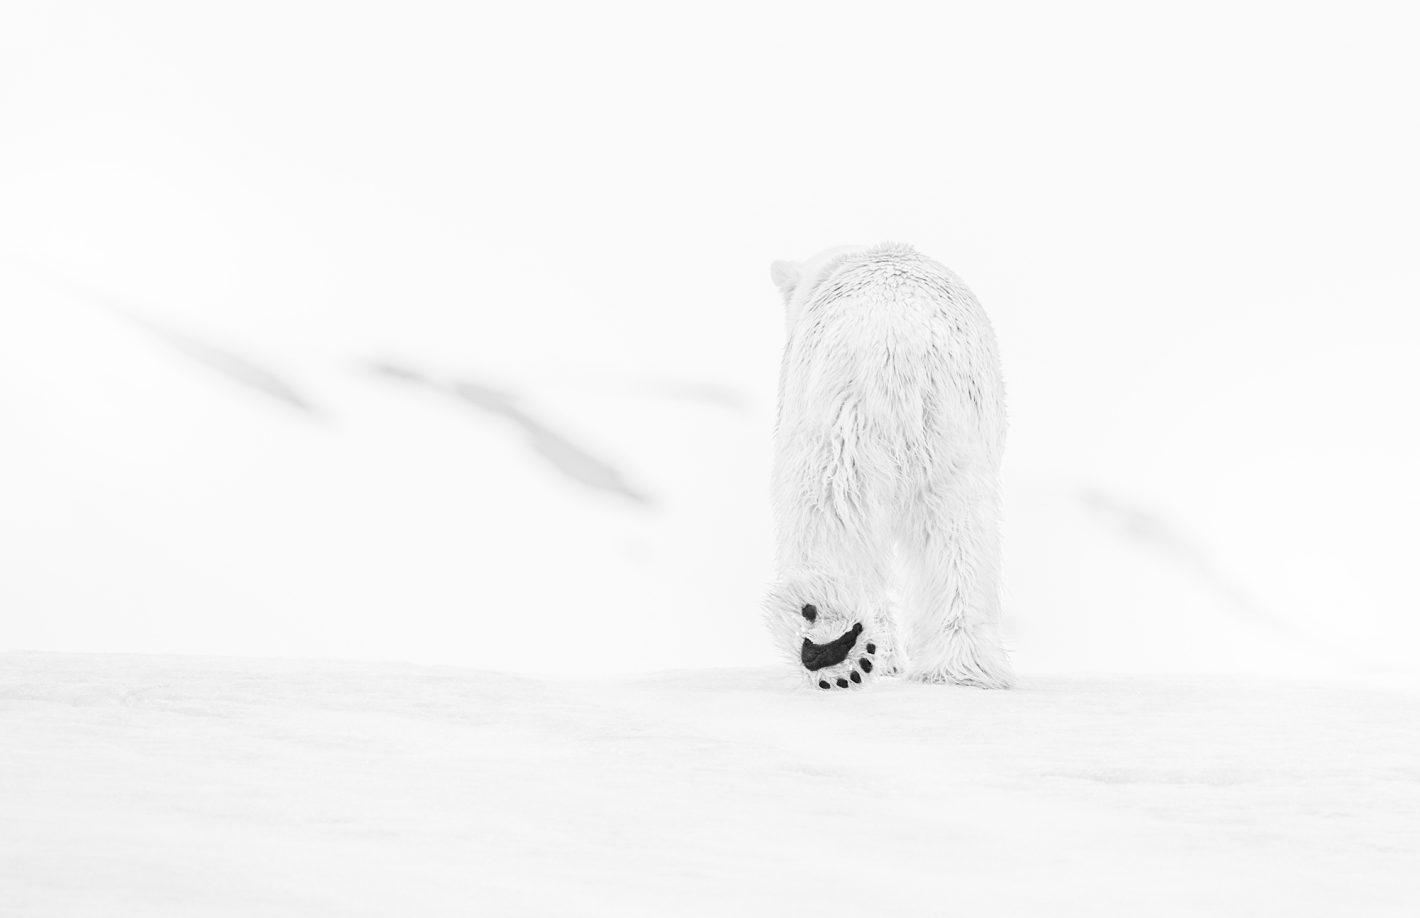 Découvrez David Yarrow, photographe ambassadeur européen de Nikon